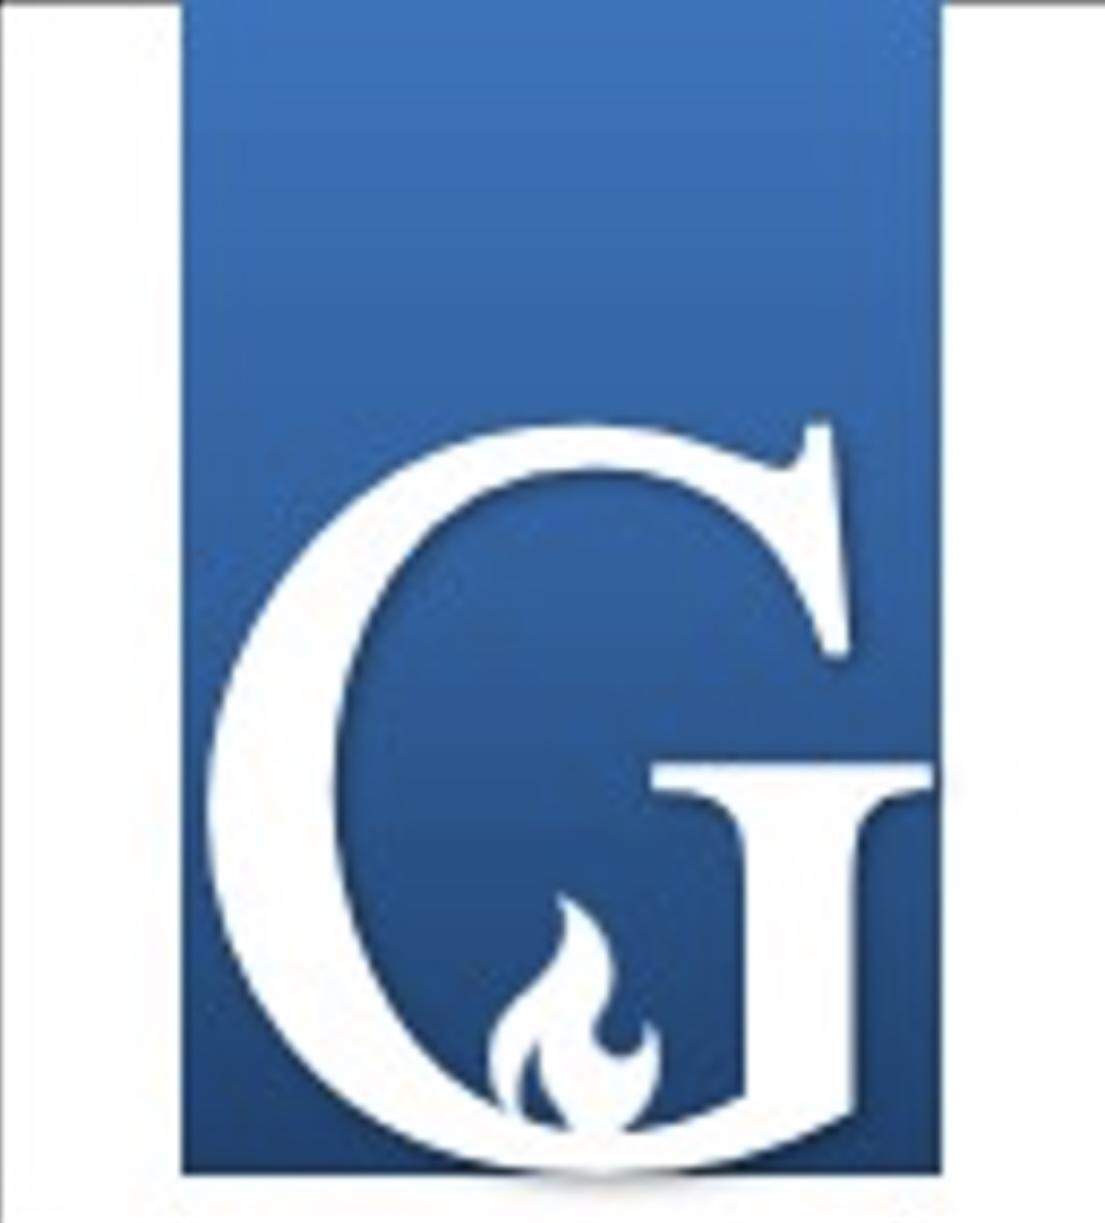 R Groom Plumbing and Heating Verified Logo